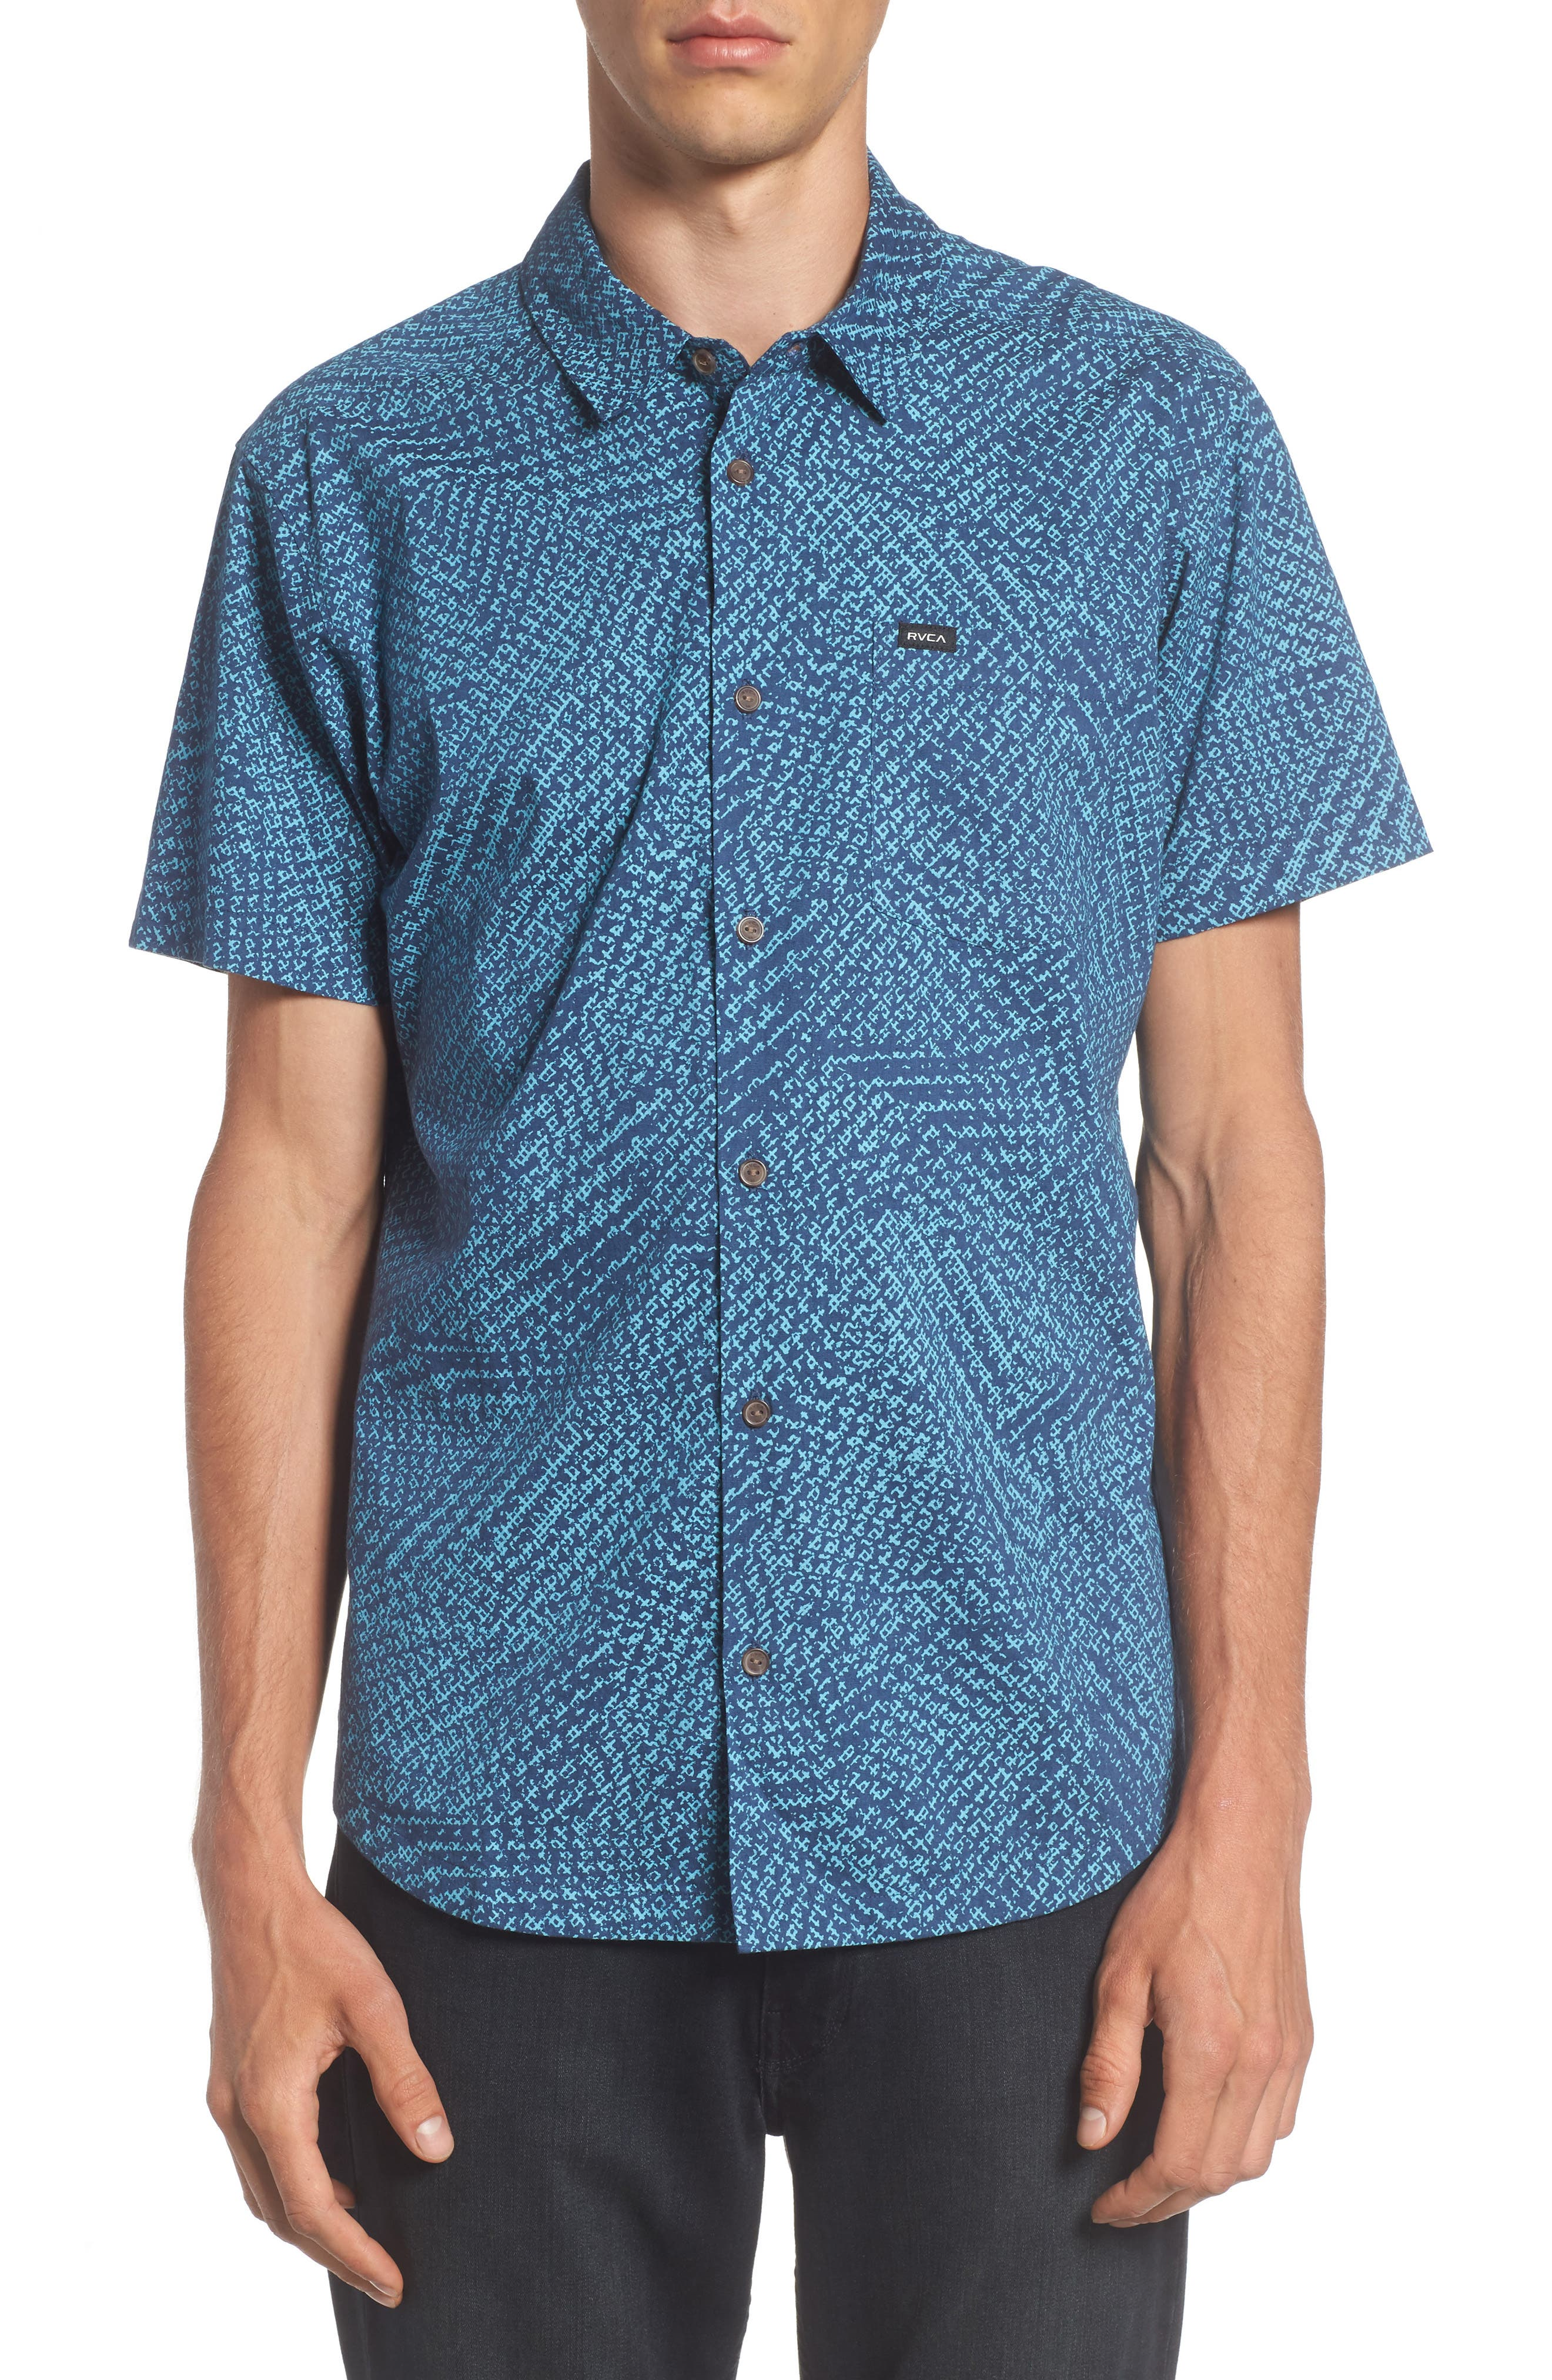 RVCA Grid Woven Shirt